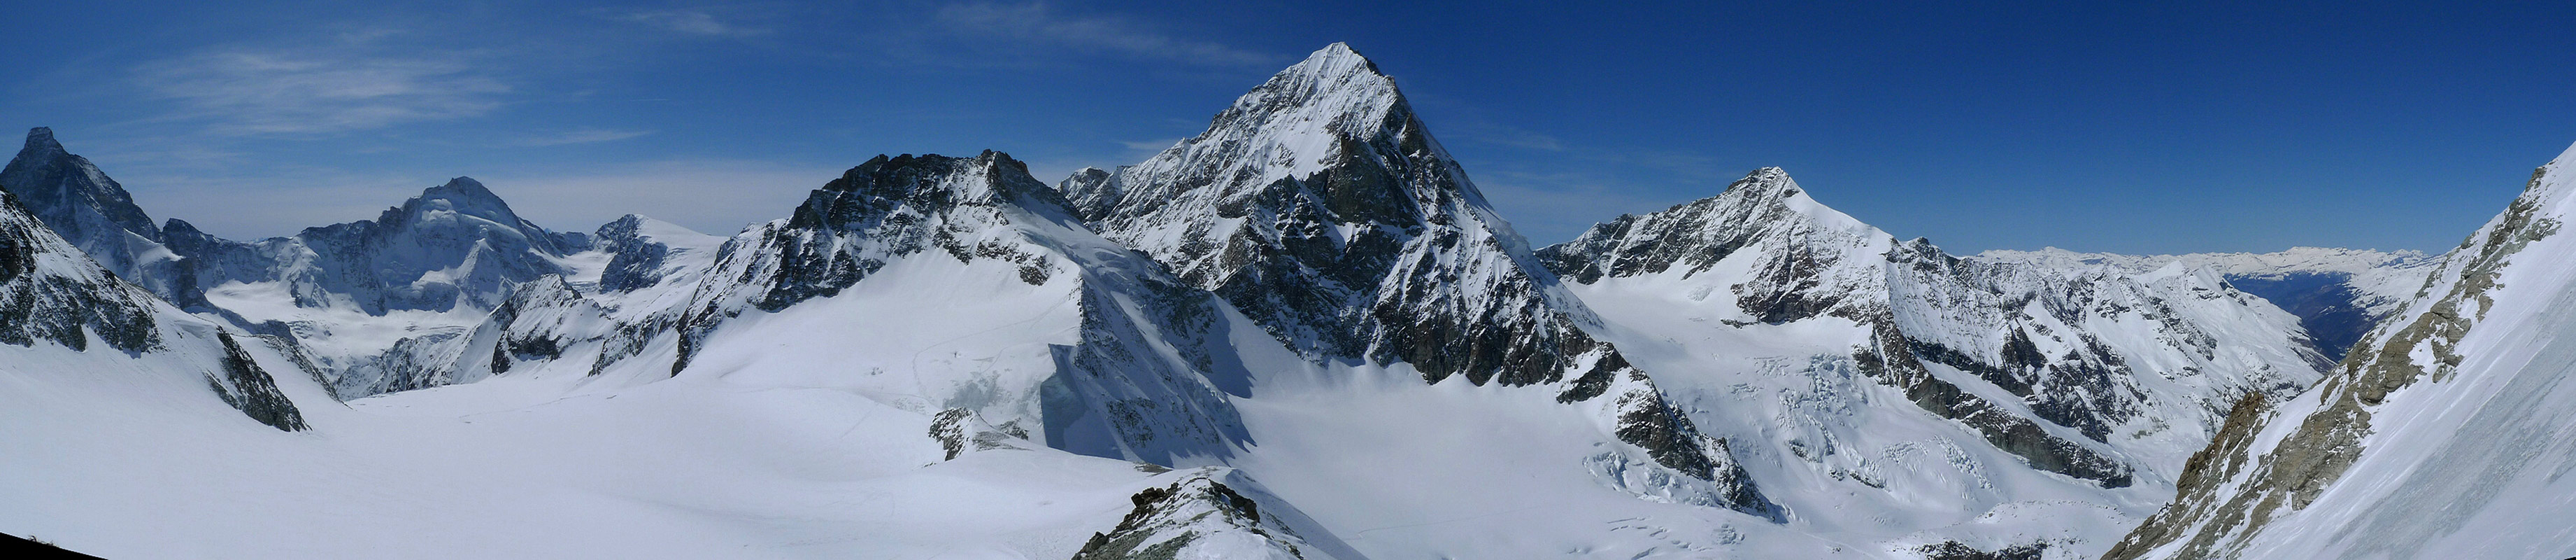 Mont Durand / Arbenhorn Walliser Alpen / Alpes valaisannes Schweiz panorama 48